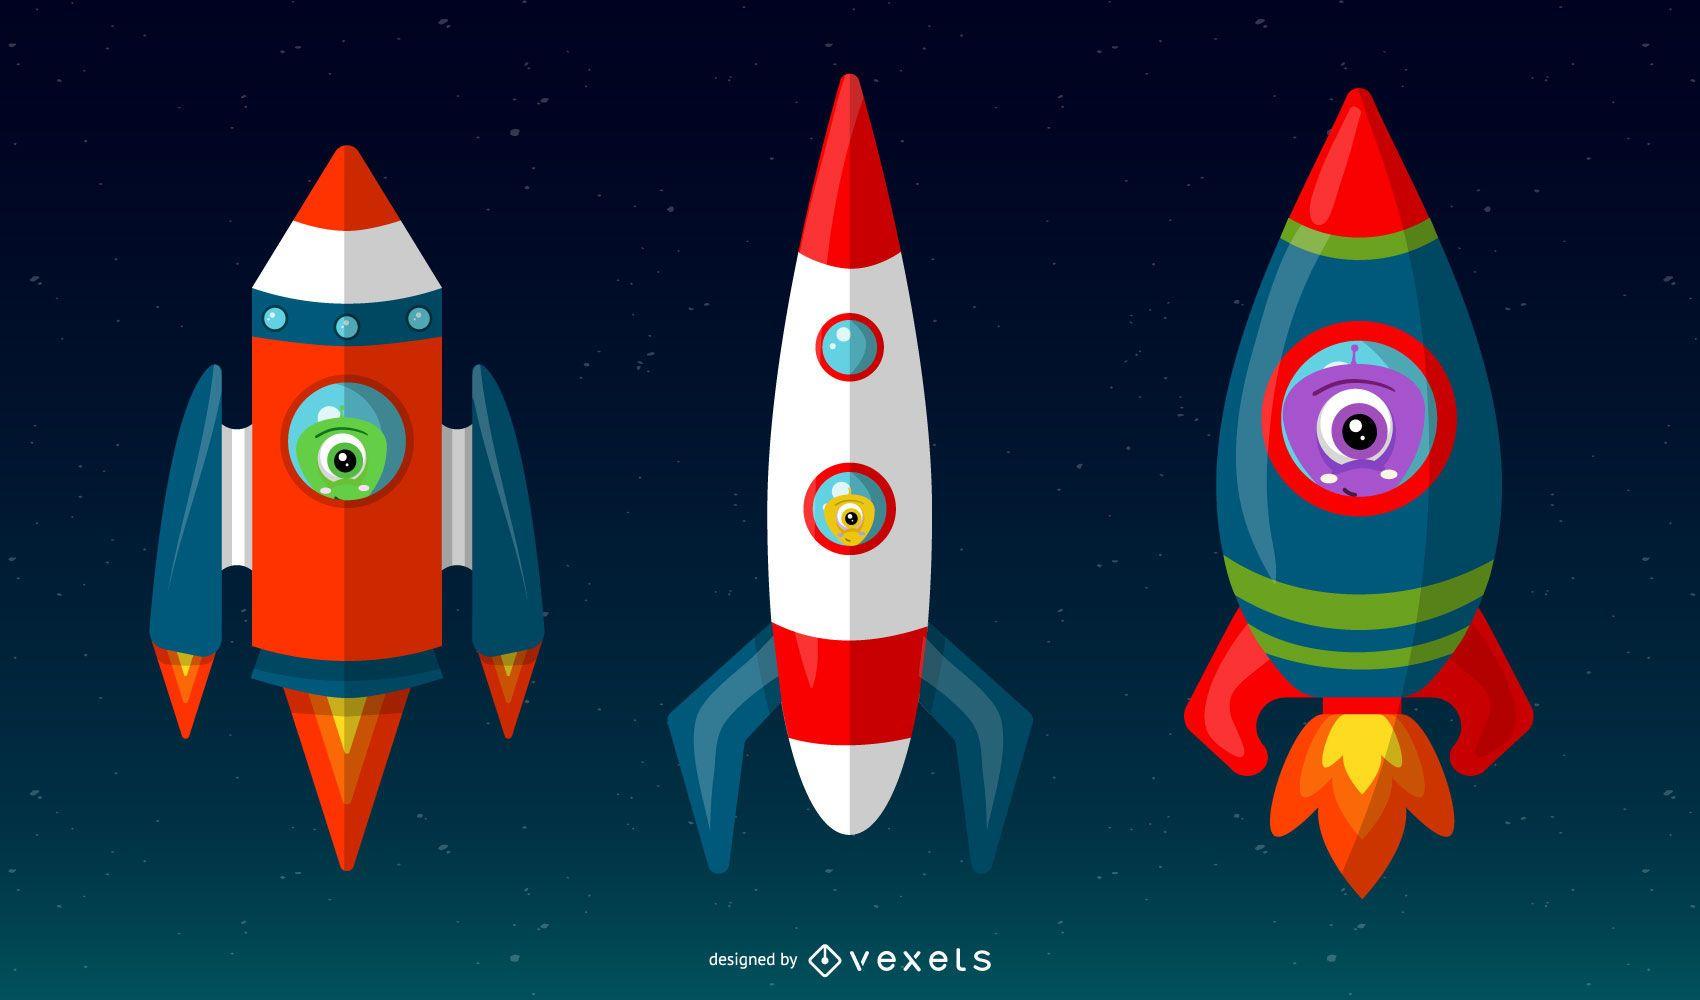 Diseño de ilustración de cohetes monstruos